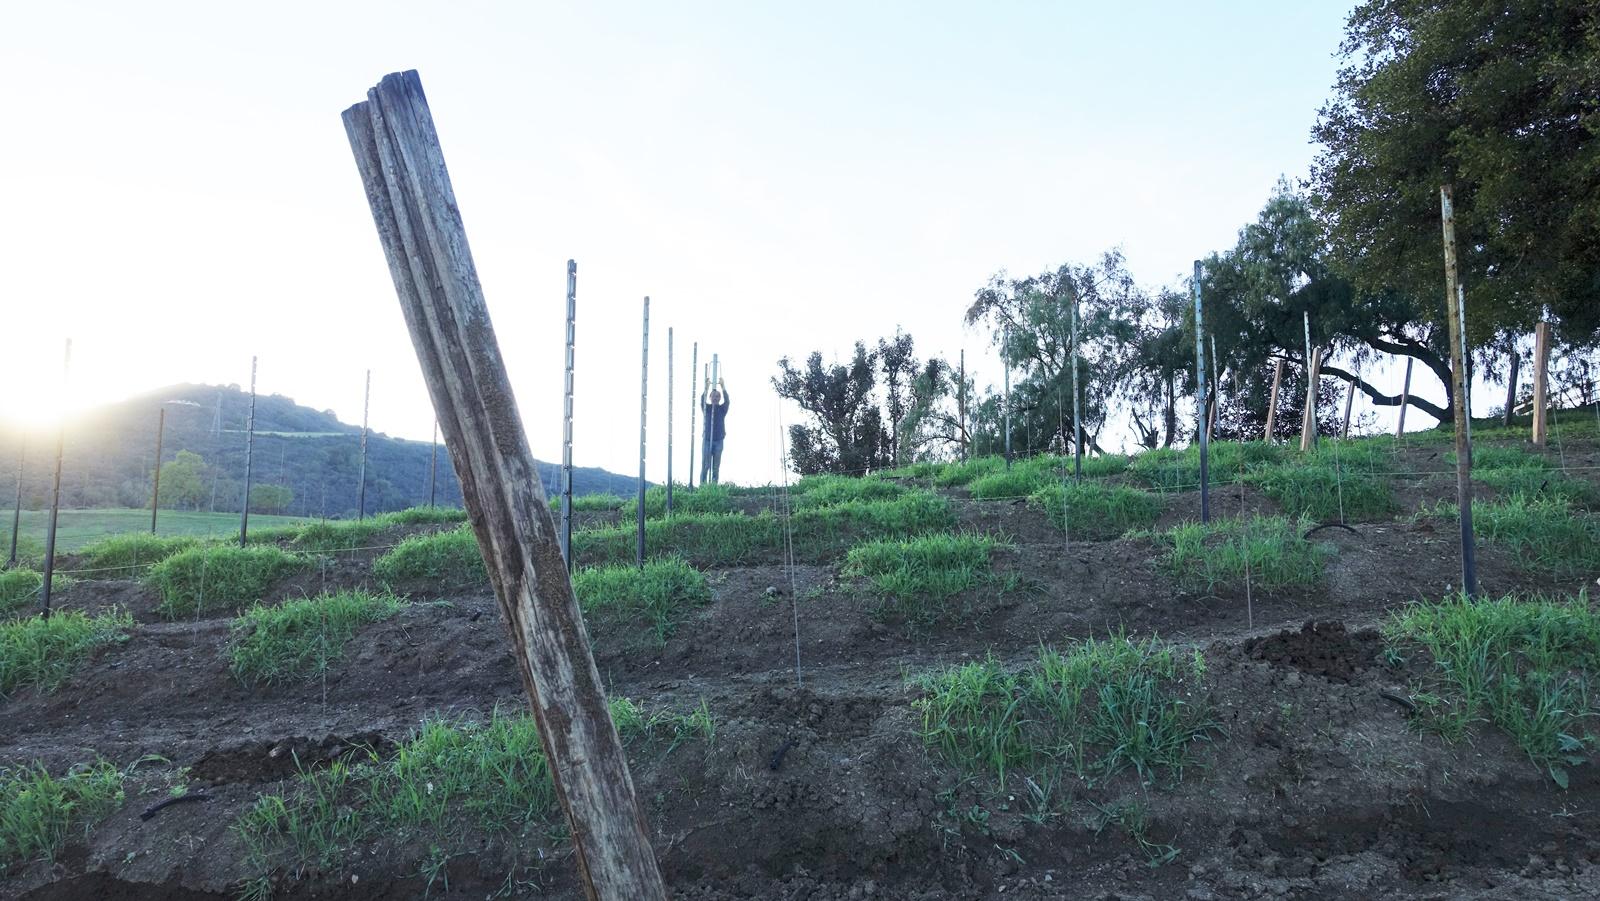 9. Hammering in poles